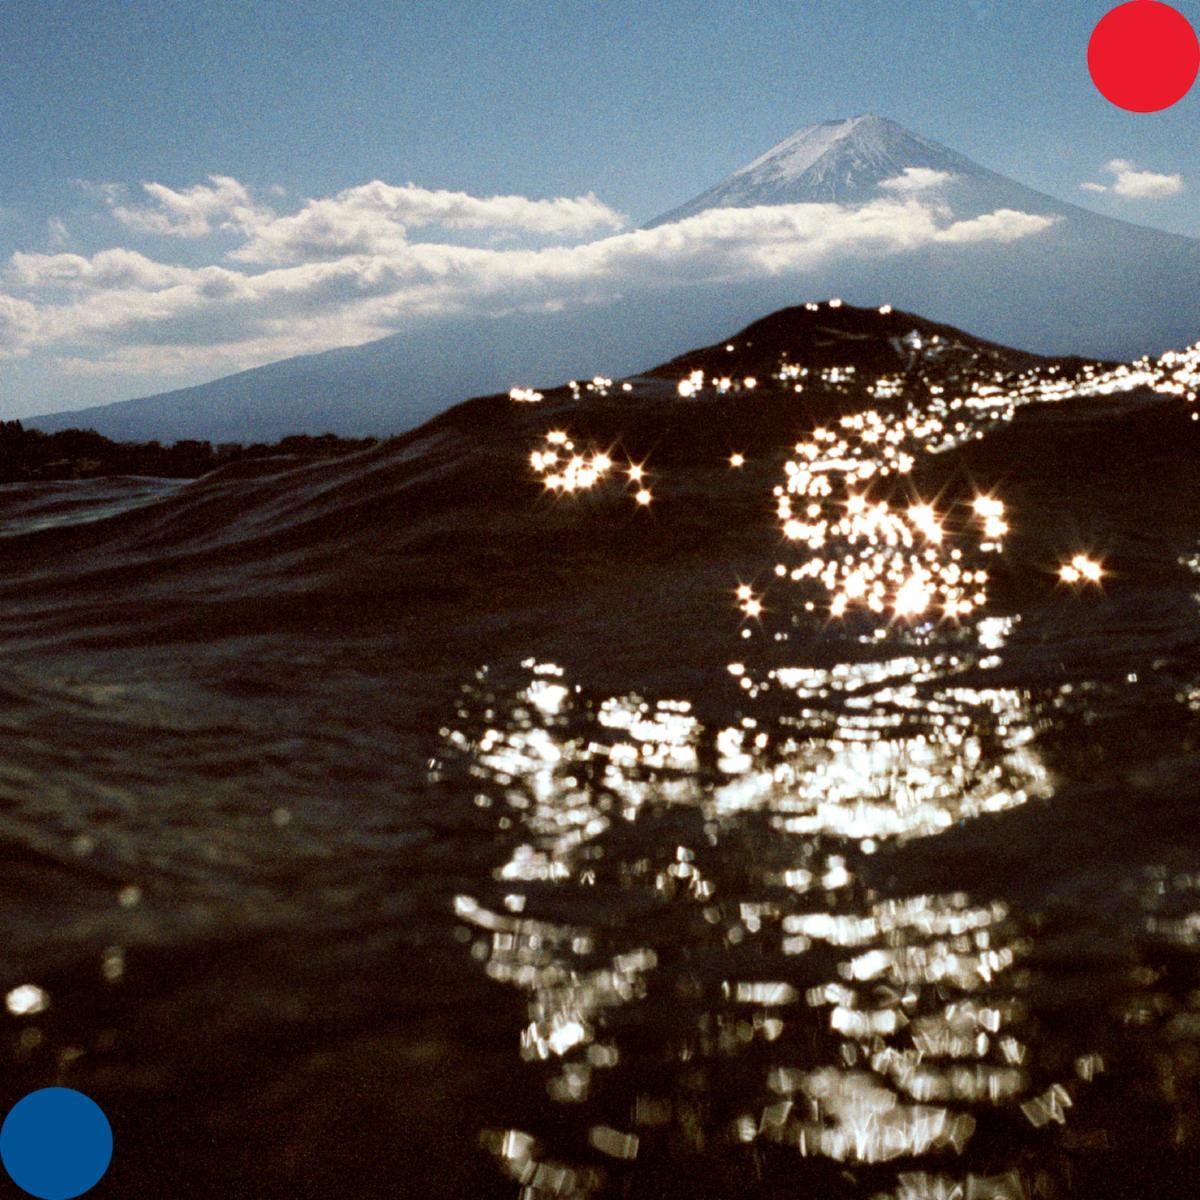 Cut Copy share sixth studio album 'Freeze, Melt'